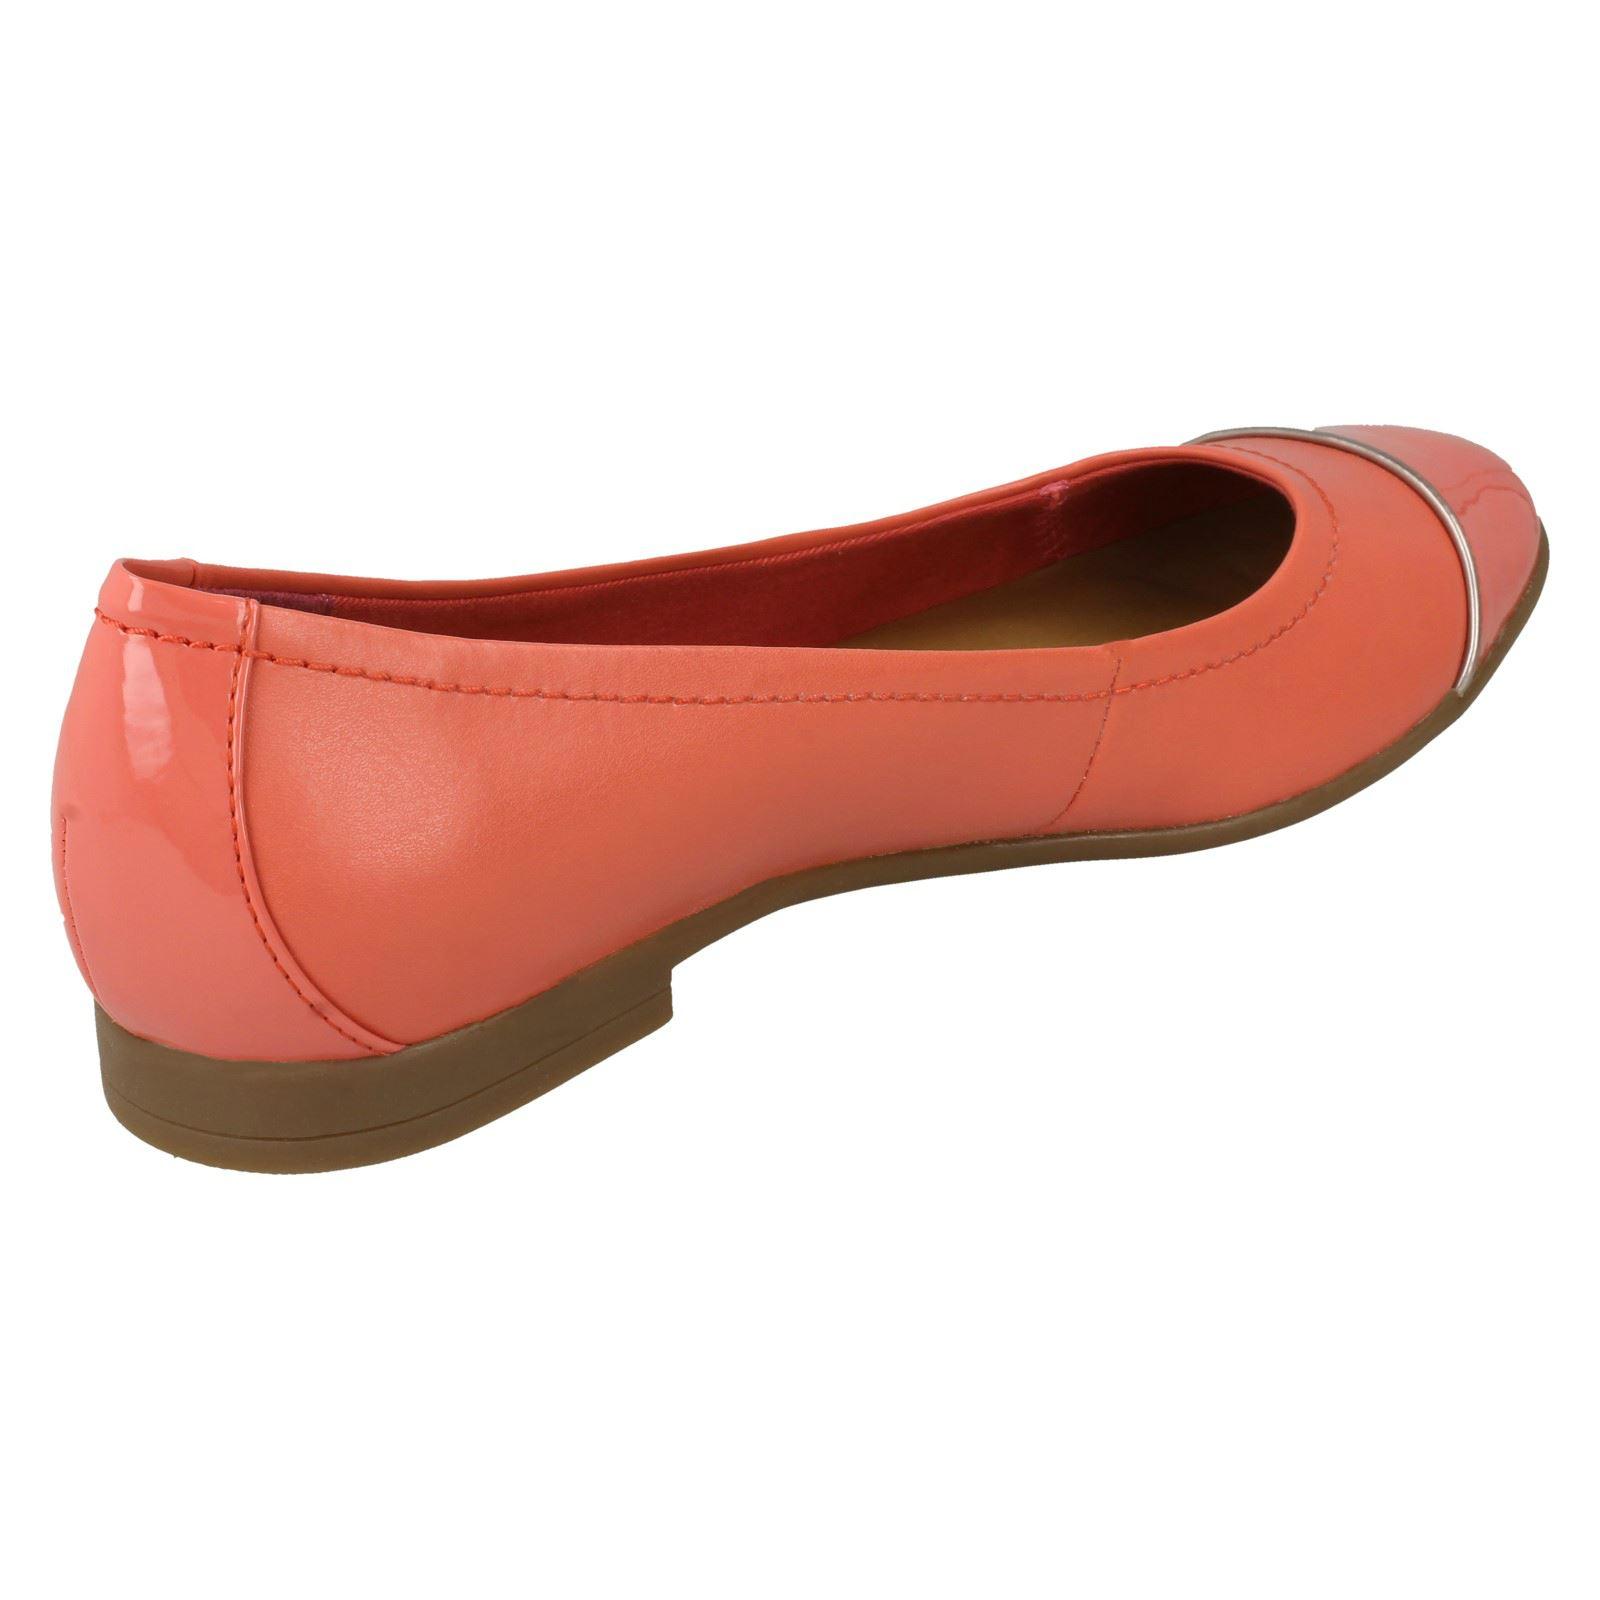 Clarks Ladies Slip On Shoes - Atomic